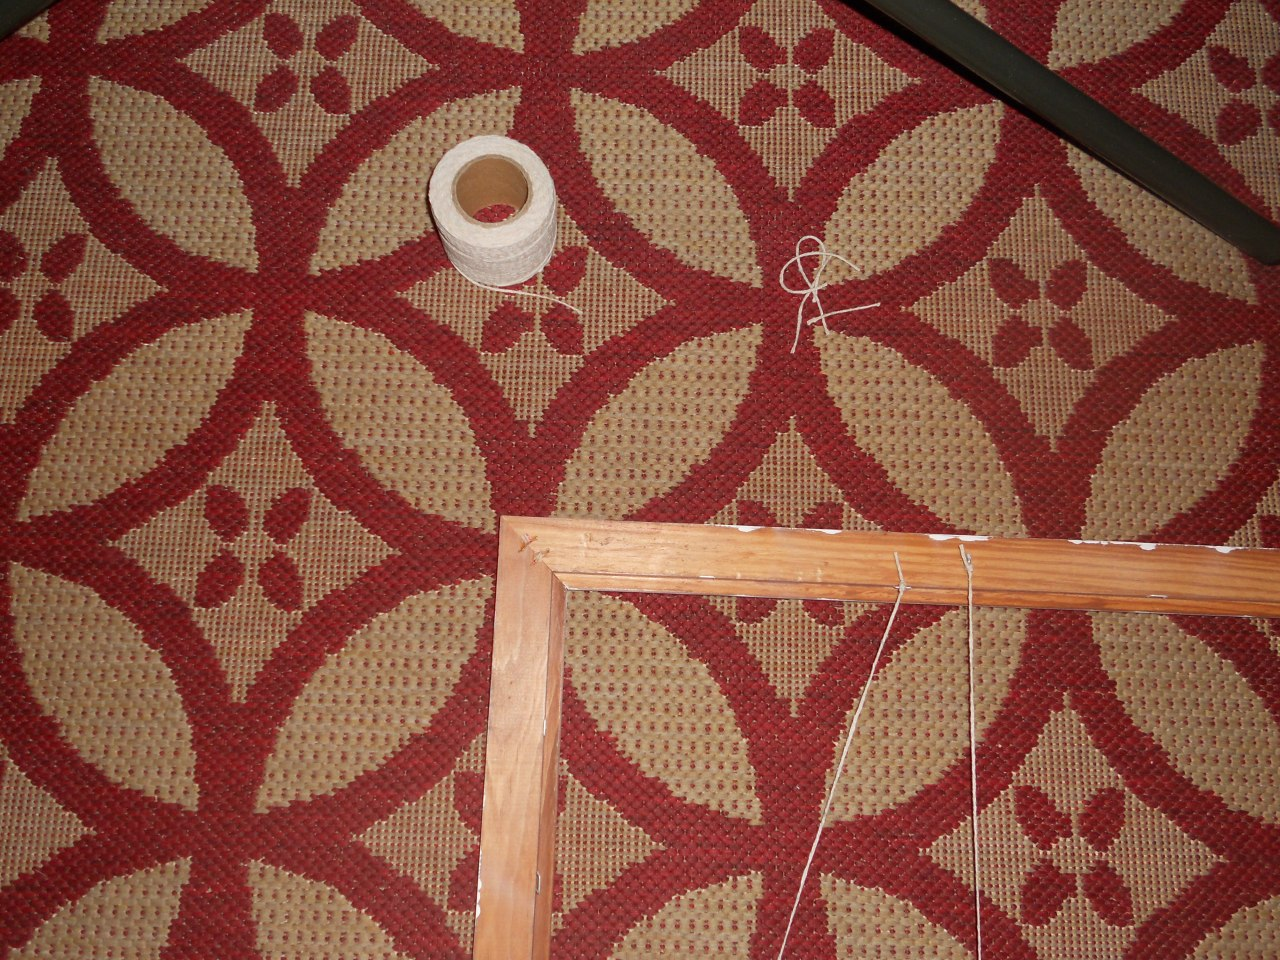 string and frame